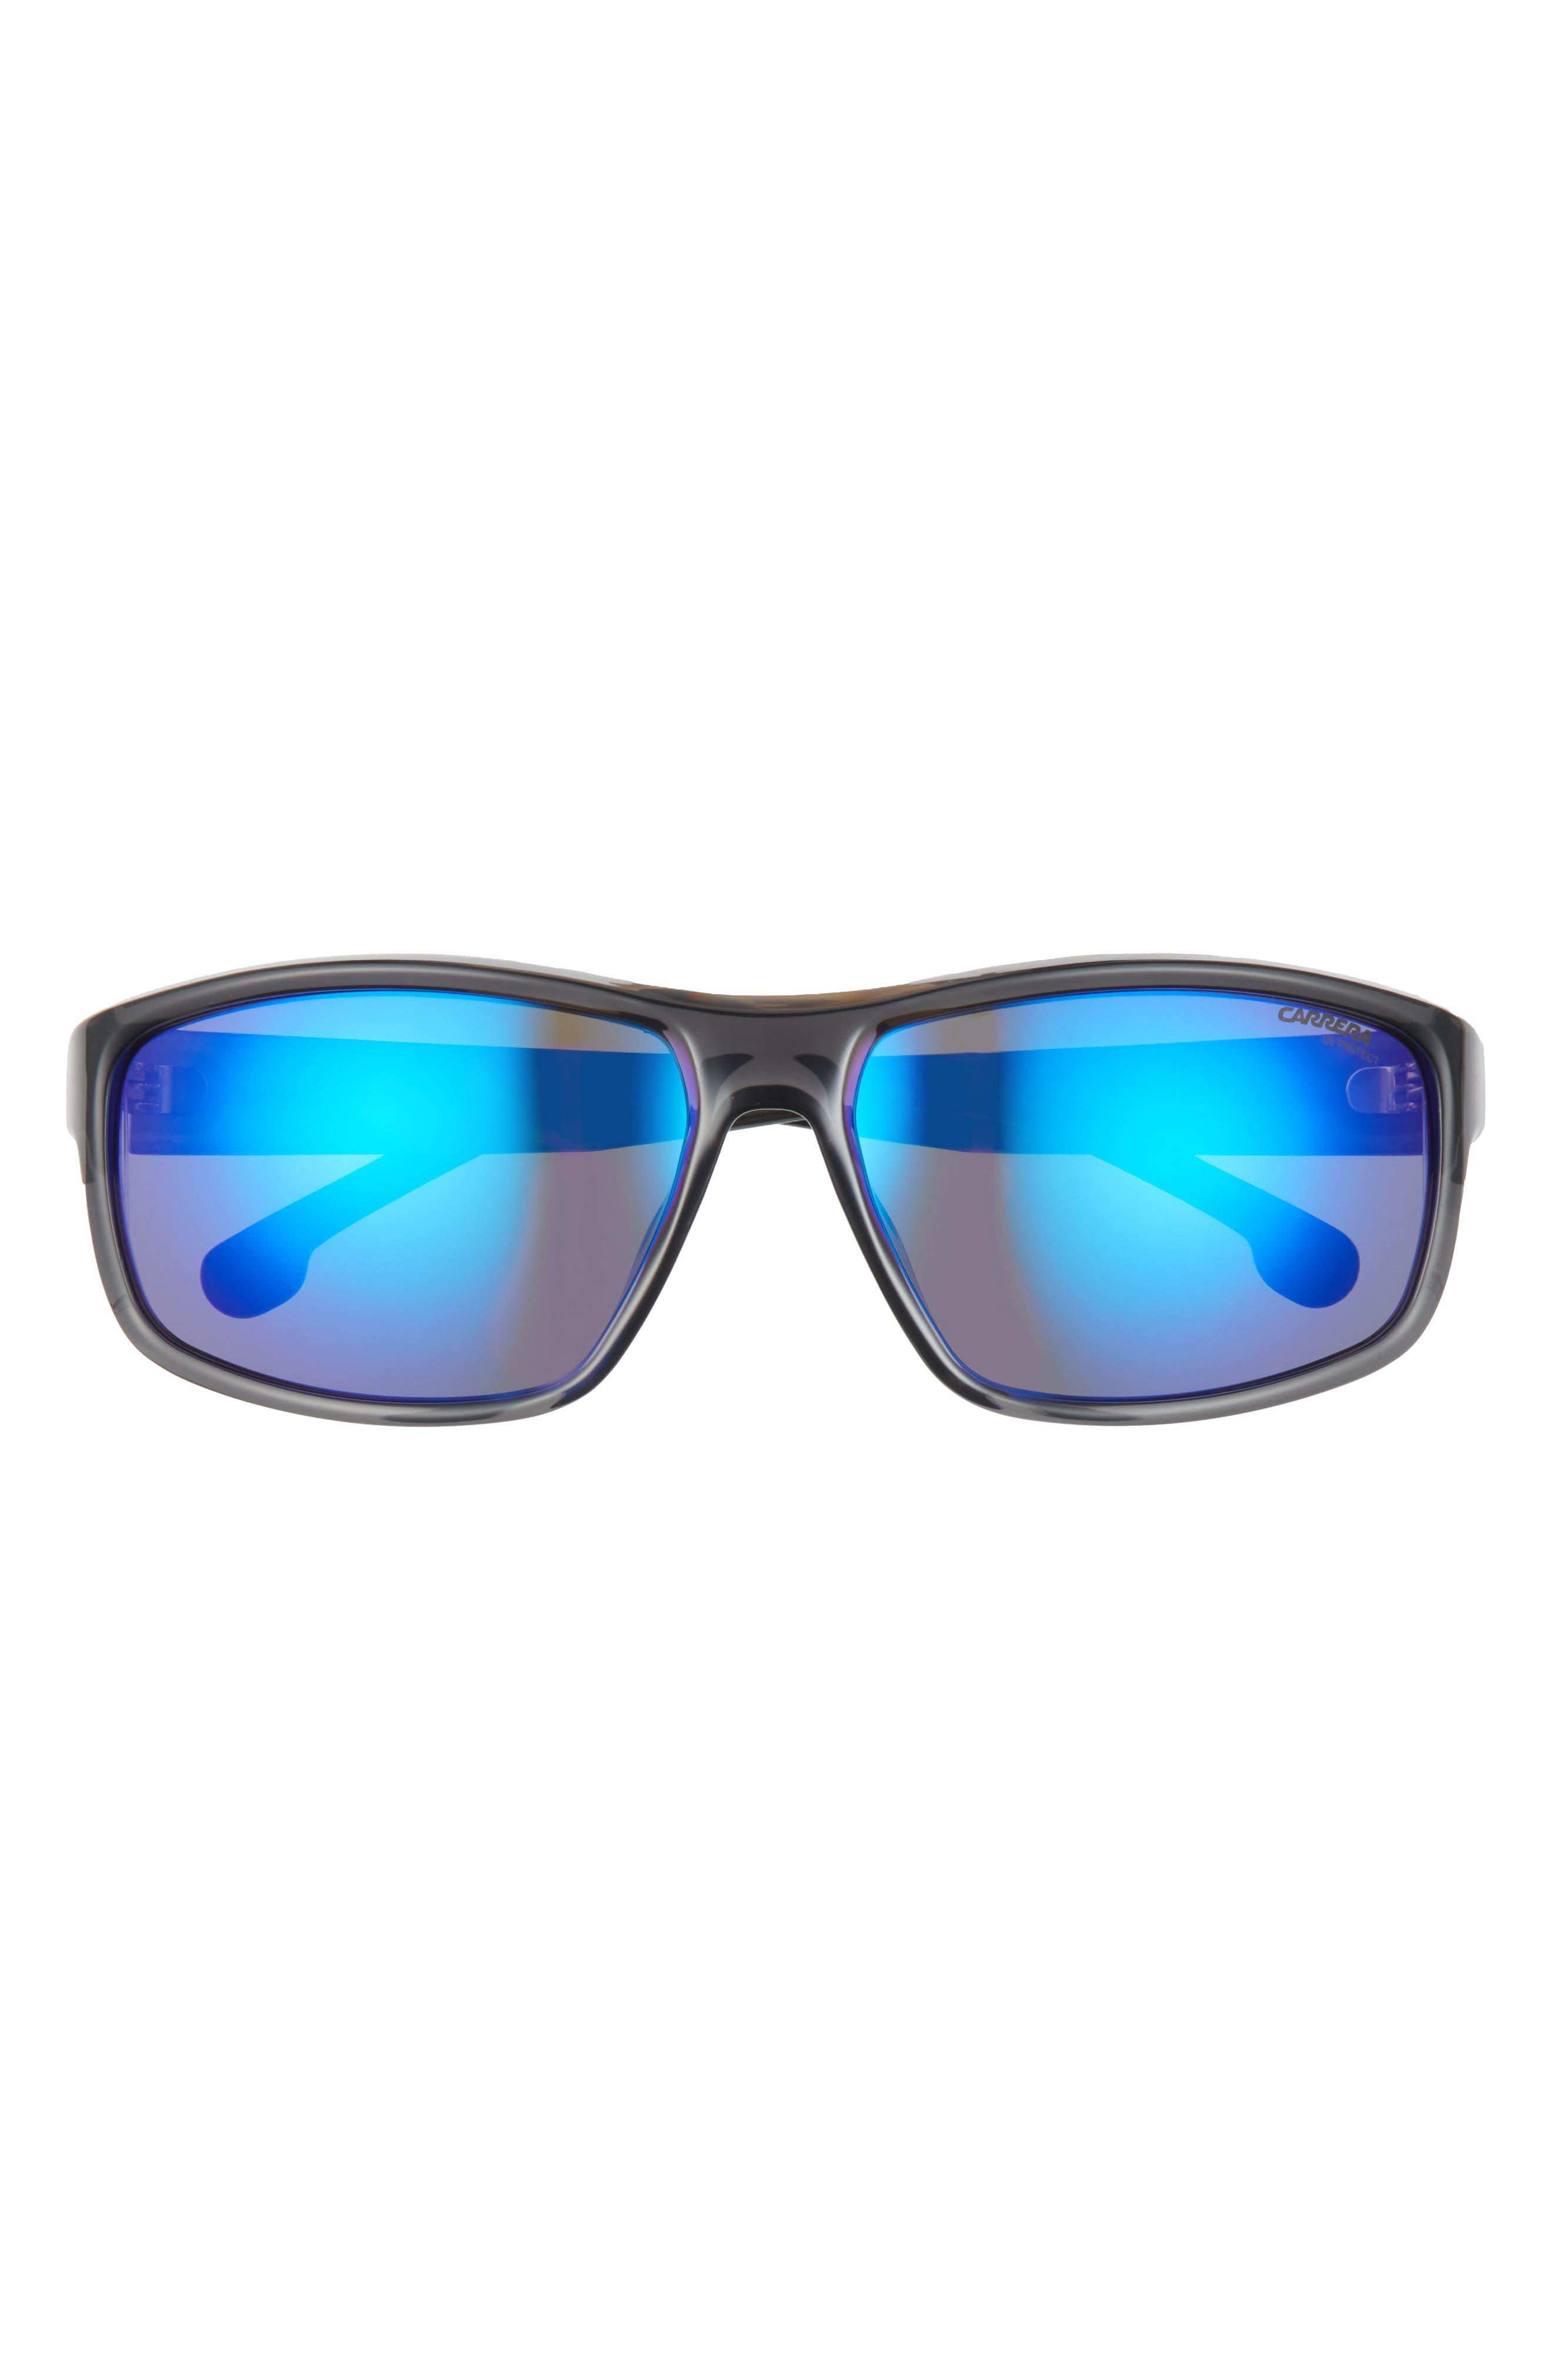 61mm Rectangular Sunglasses